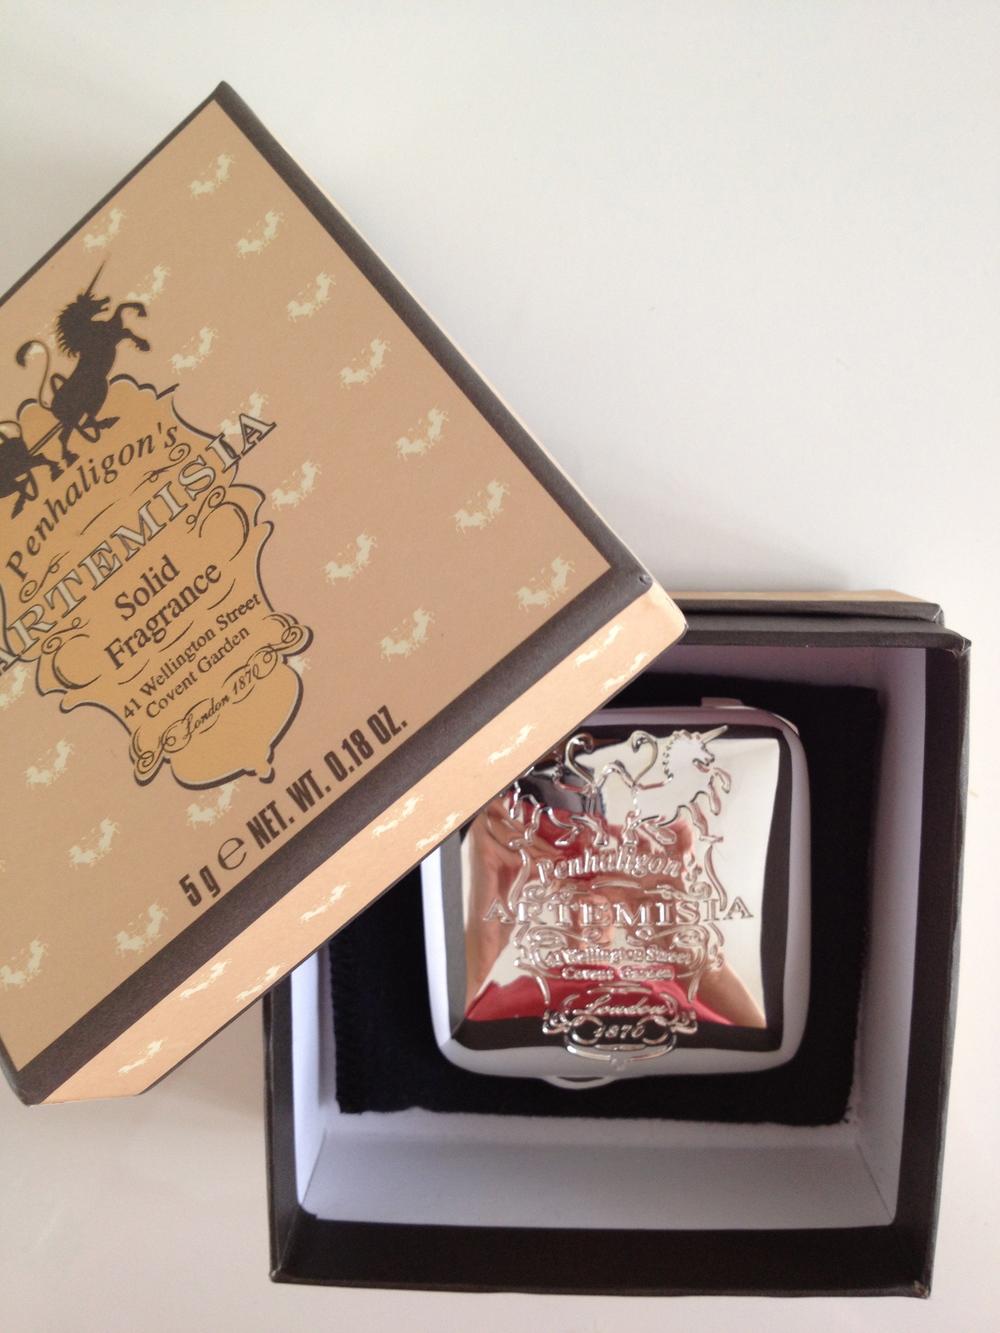 Artemisia solid perfume in silver compact